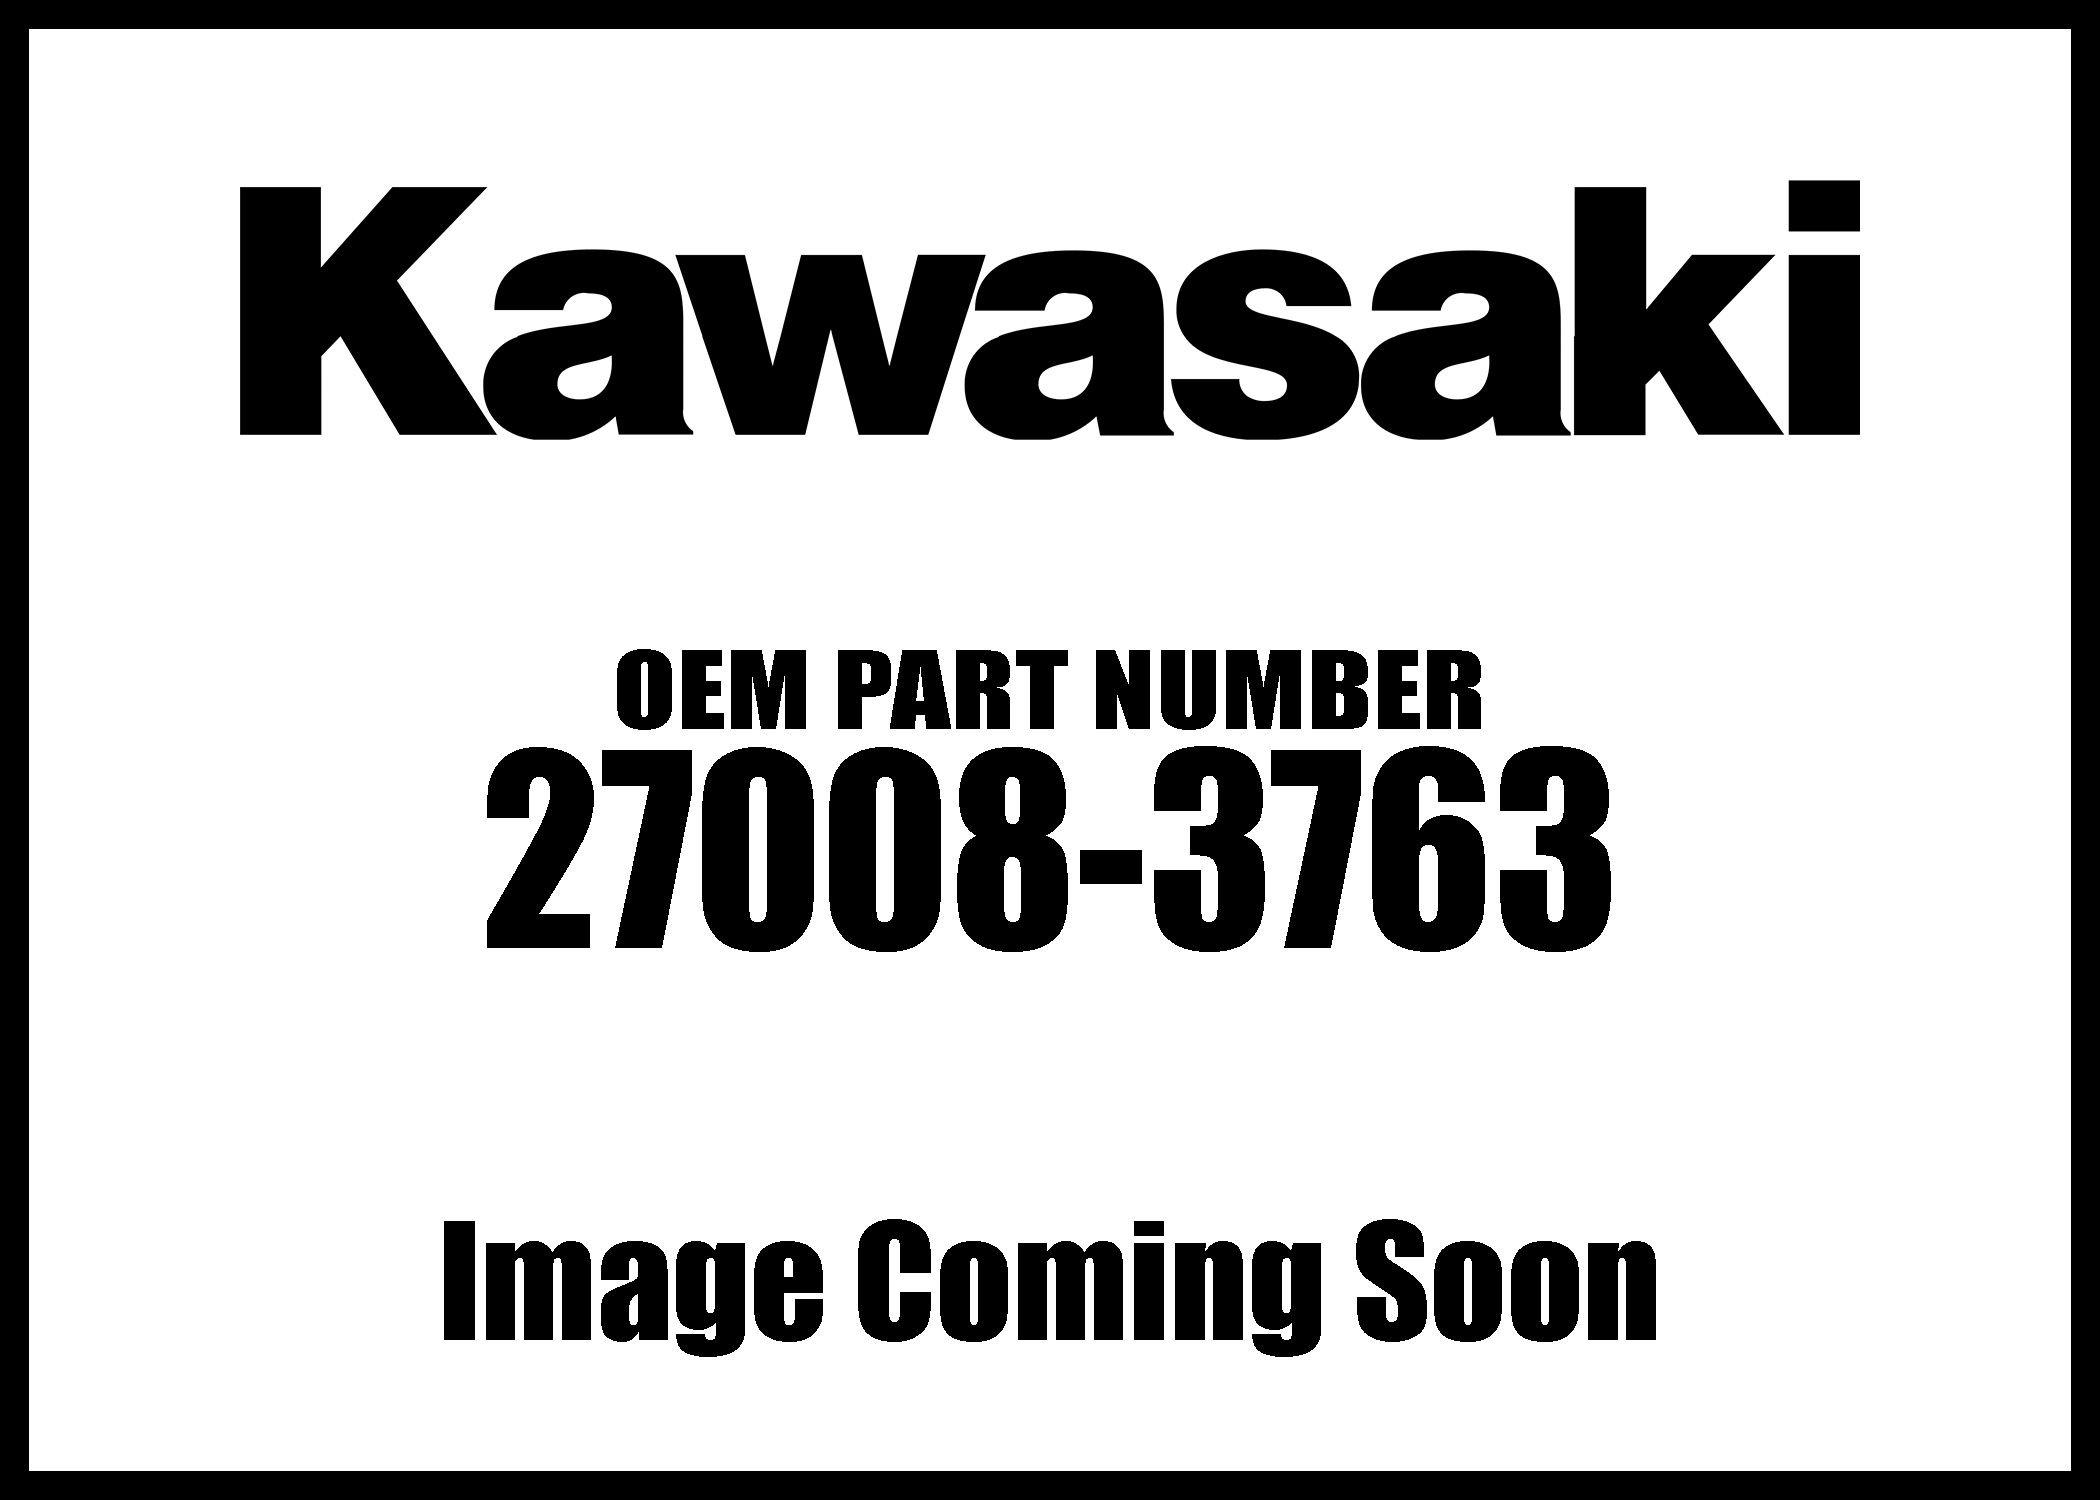 Kawasaki 1995-2007 Jet Ski 1100 Stx Jet Ski Ultra 150 Lock Key 27008-3763 New Oem